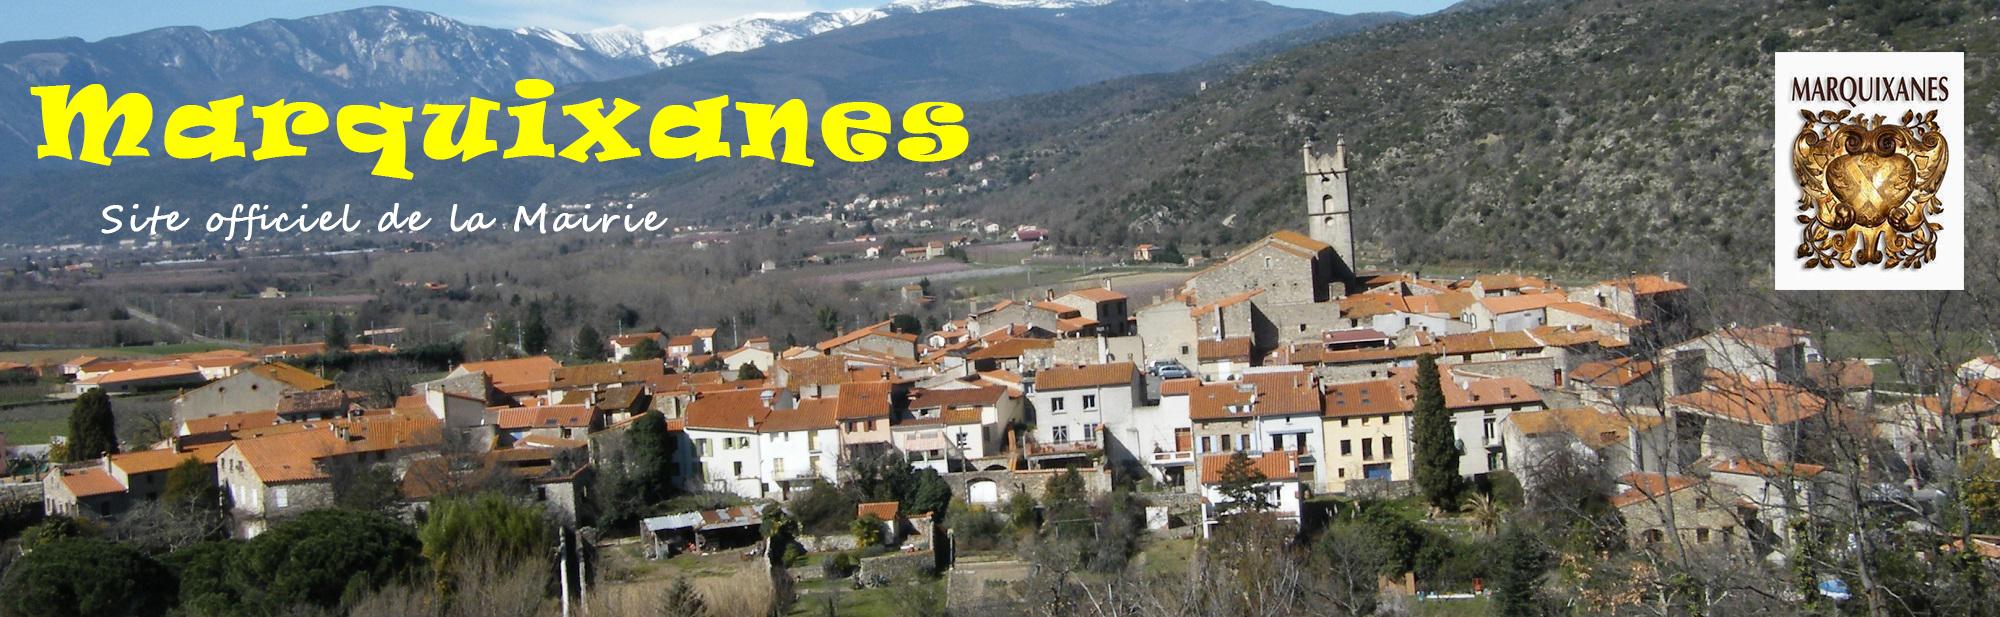 Ville de marquixanes for Exterieur nature marquixanes